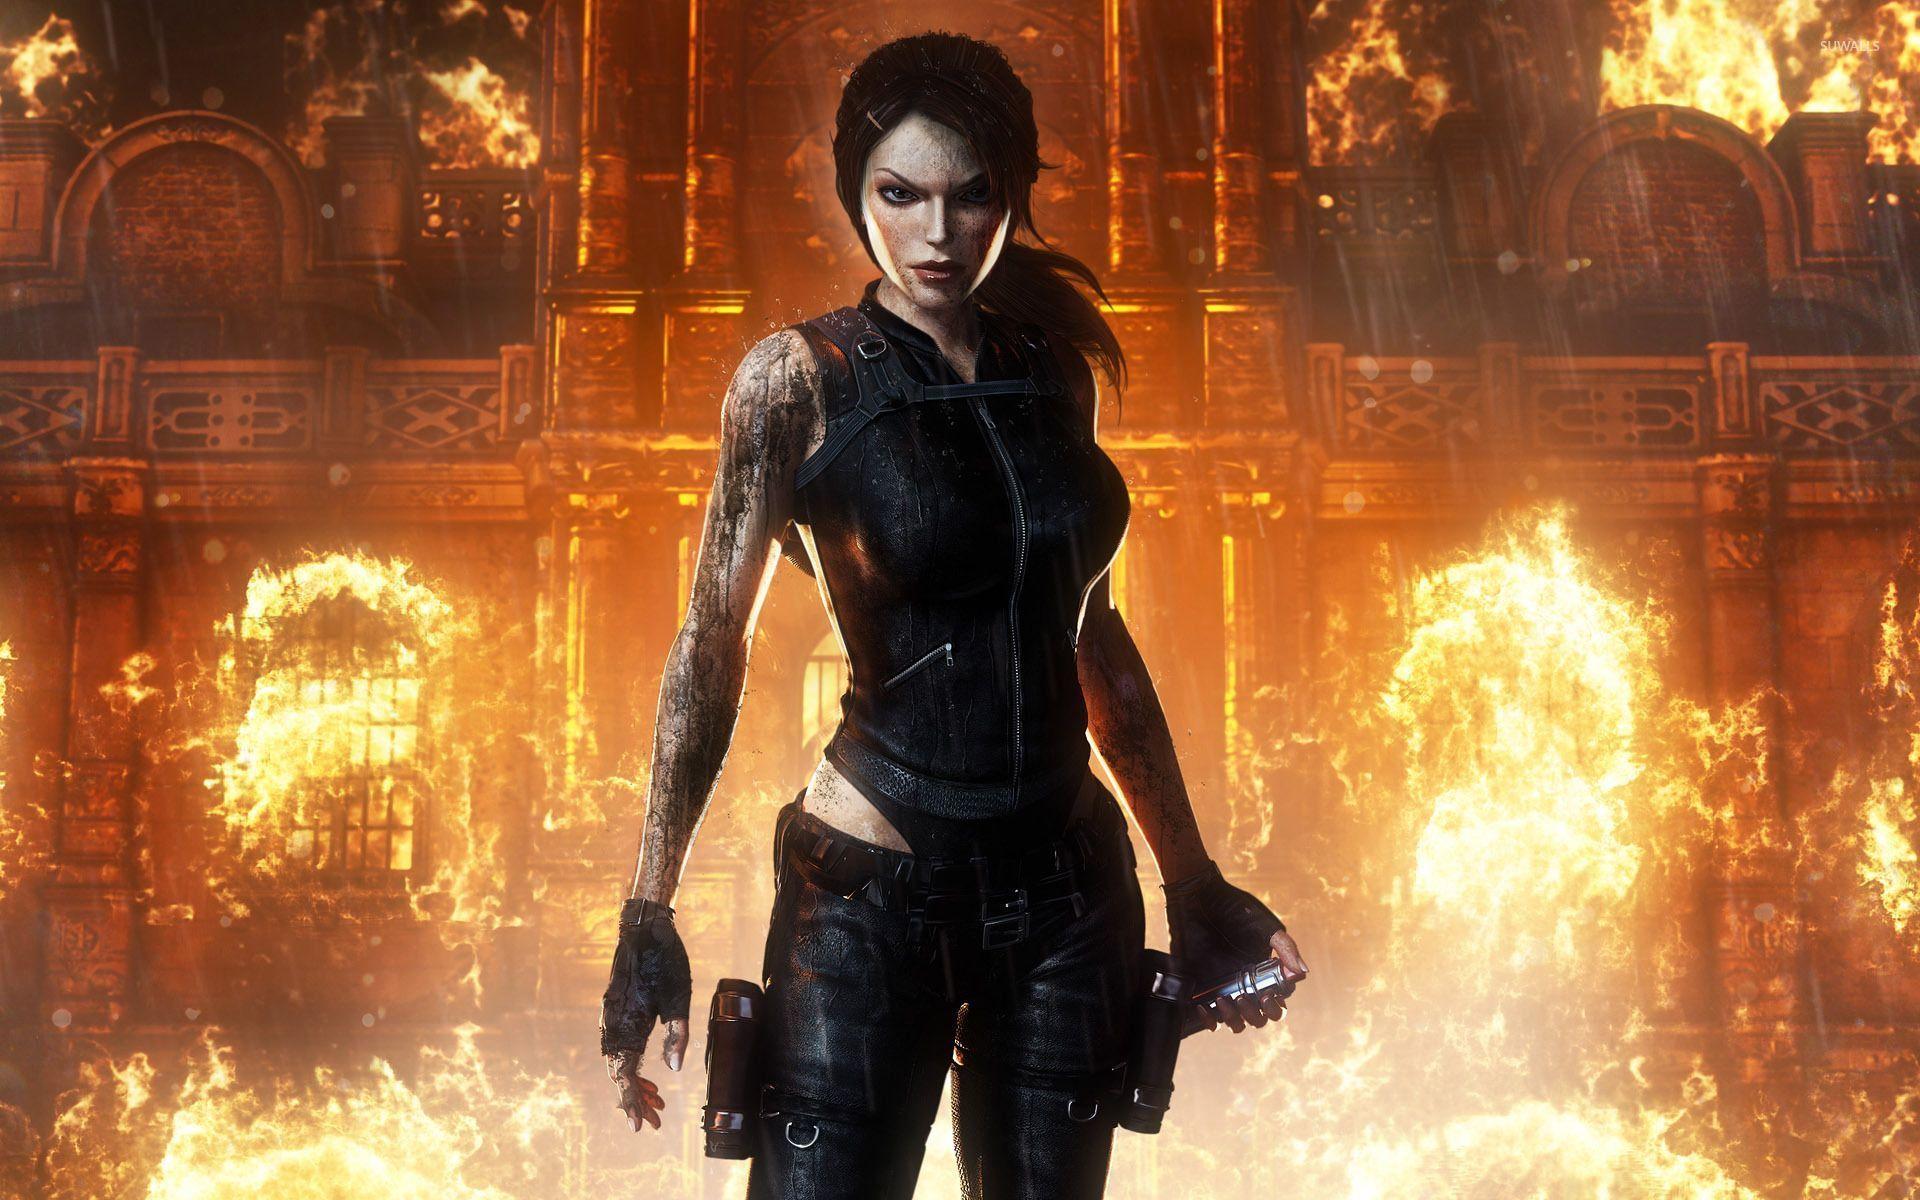 Lara Croft Exiting A Burning Building Tomb Raider